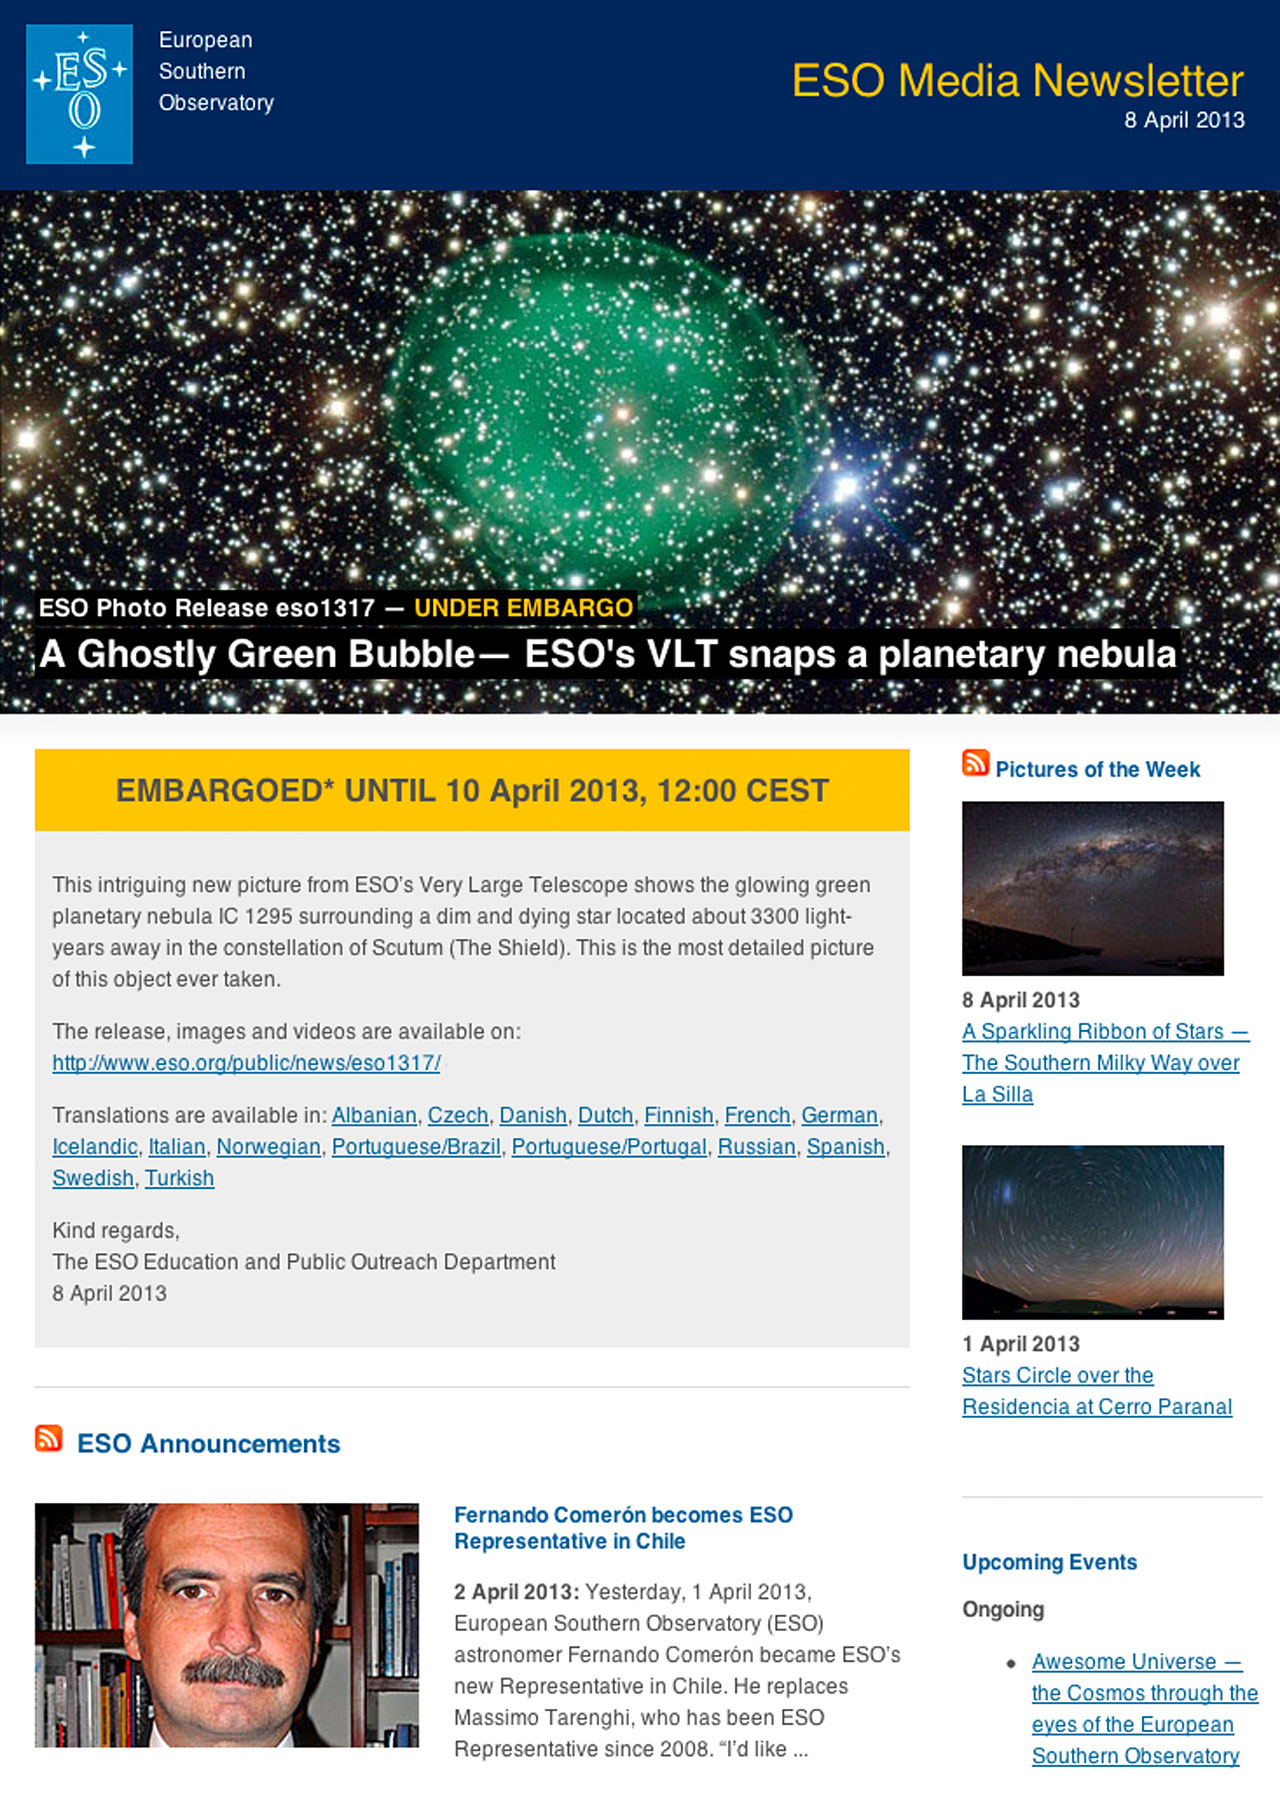 ESO Media Newsletter — 8 April 2013